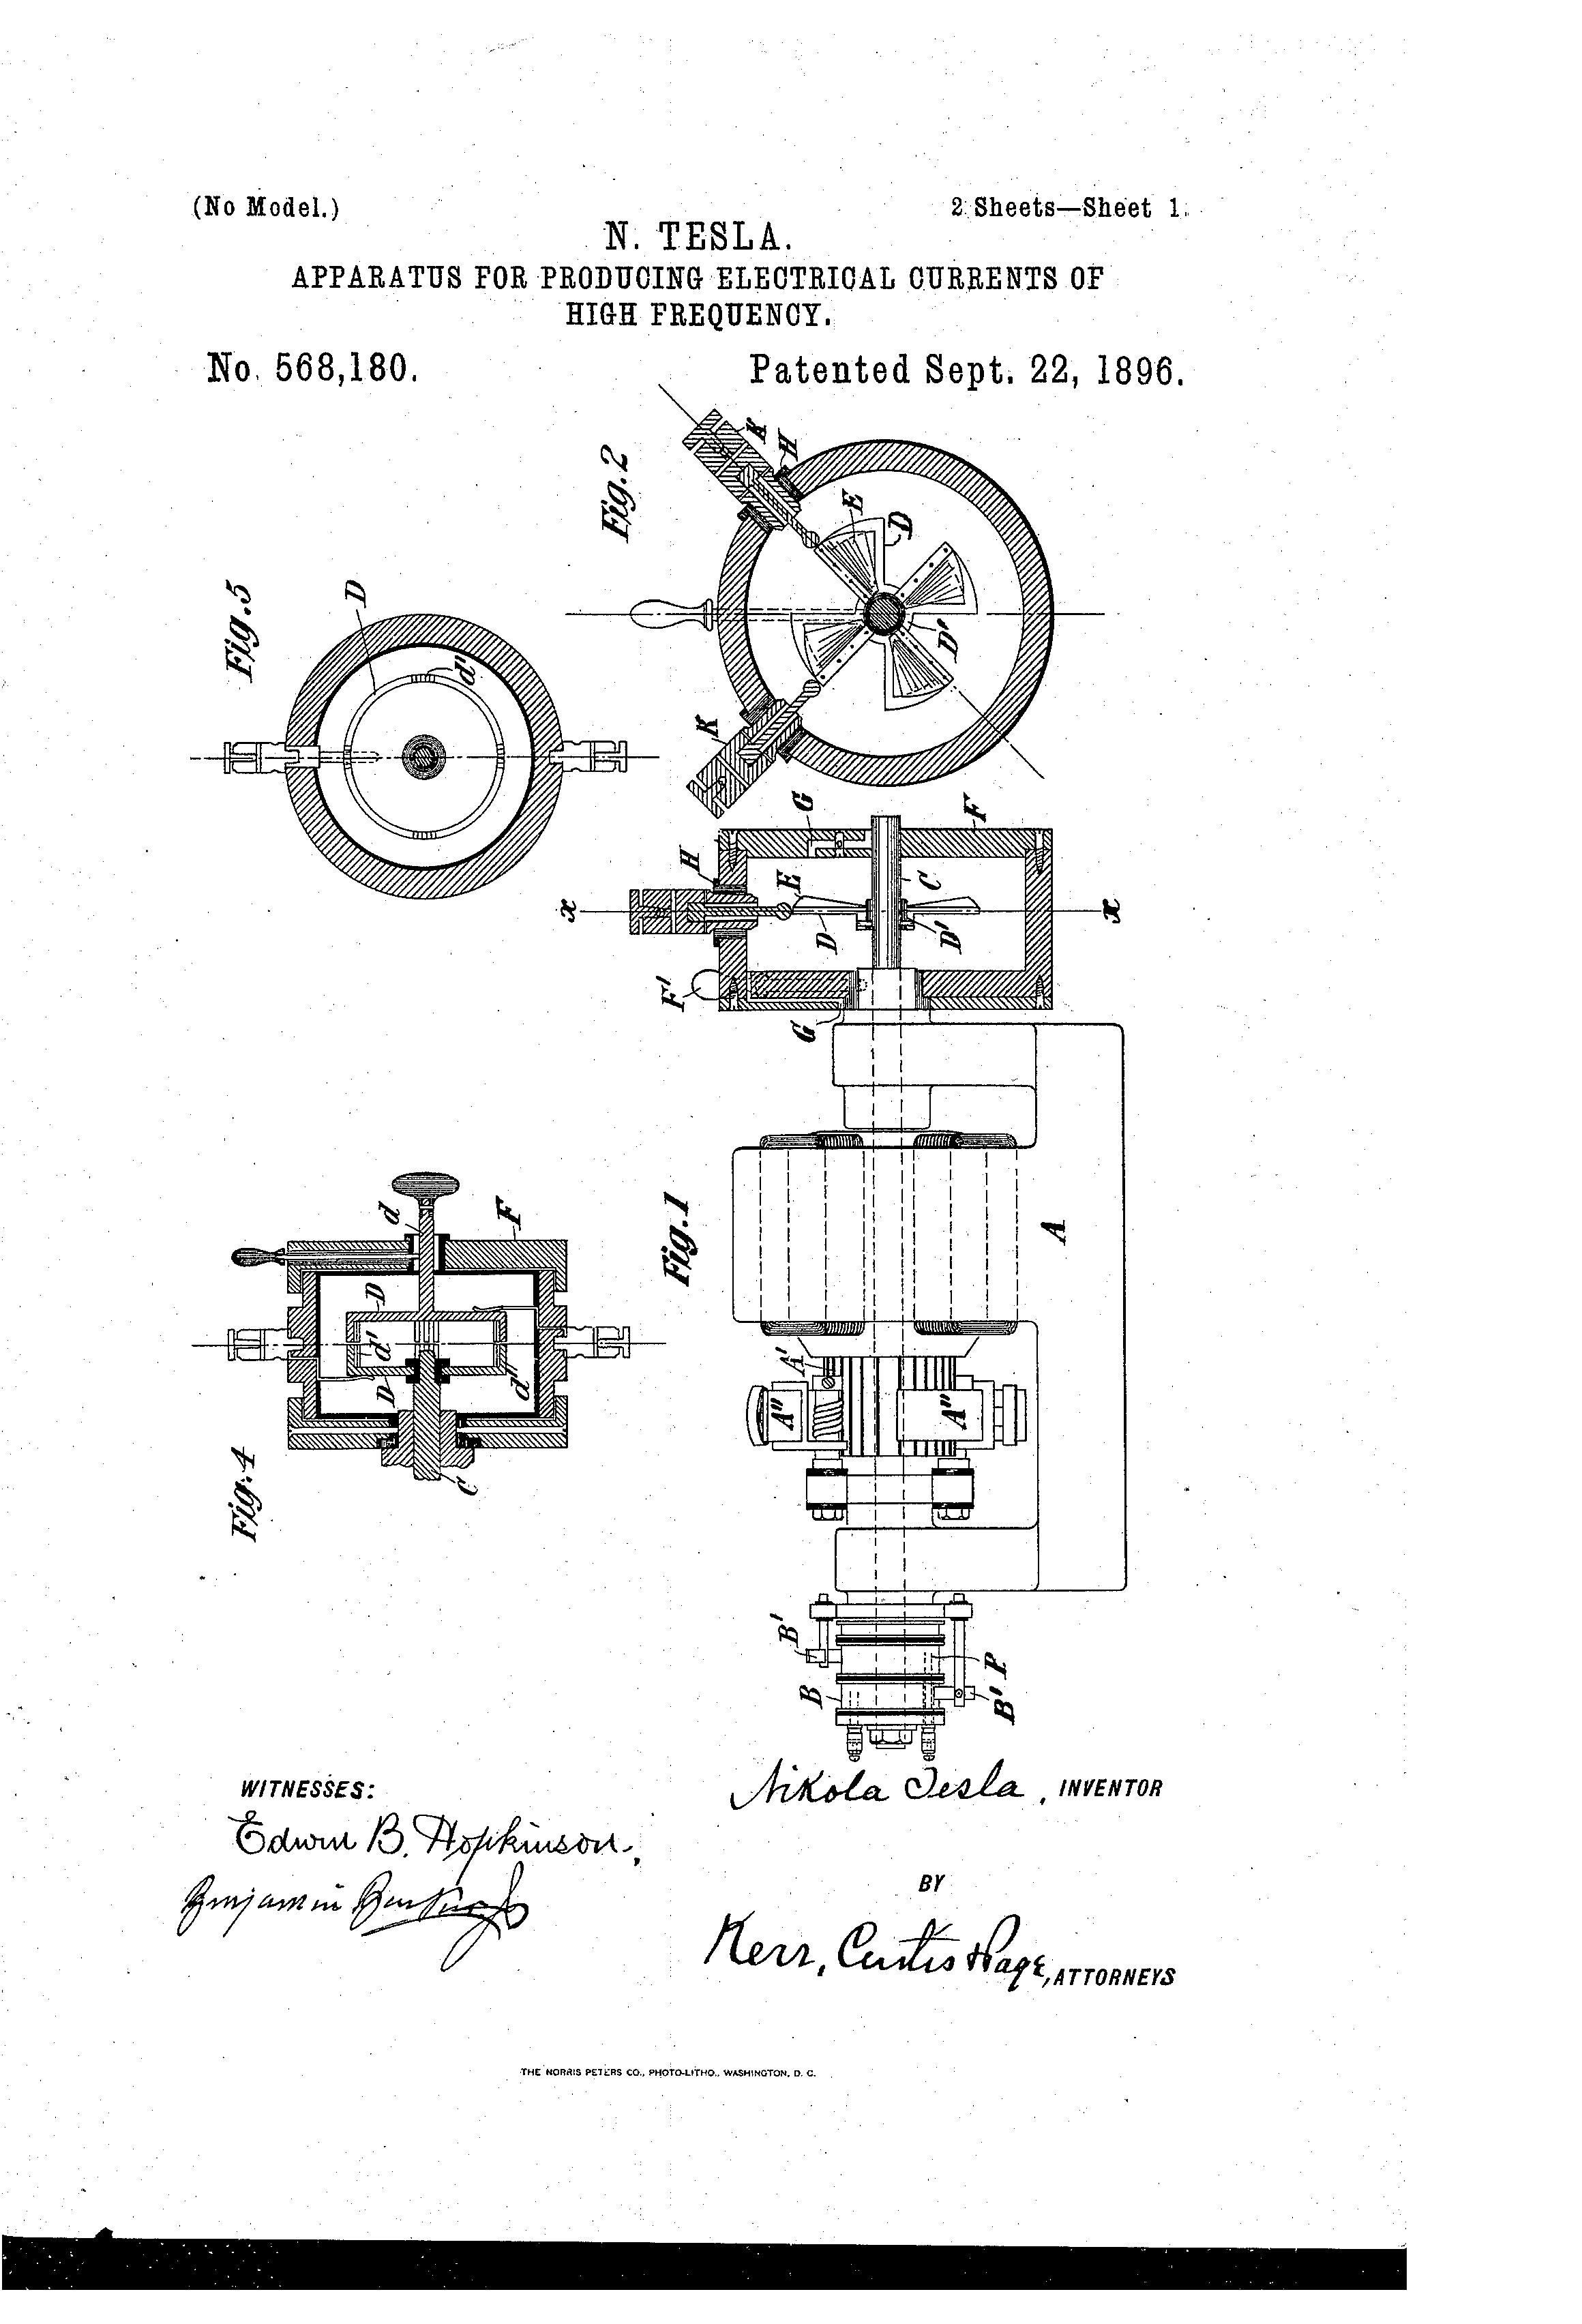 patent us568180 - nikola tesla